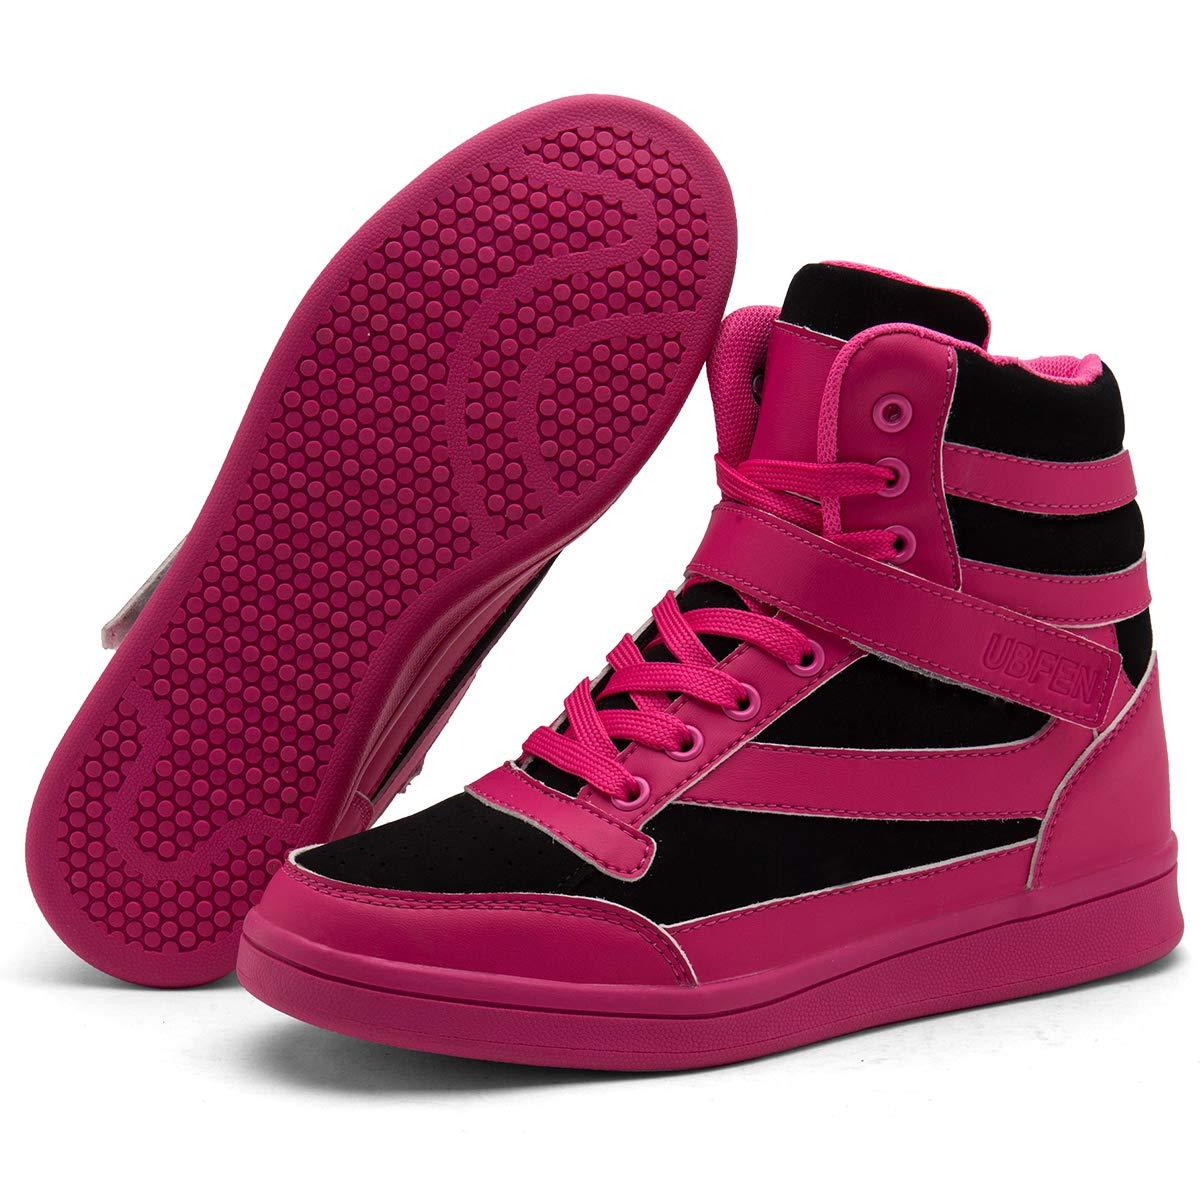 58b0e6a9c2d UBFEN Women's Shoes Hidden Wedge Heel 5.5cm Fashion Sneakers ...